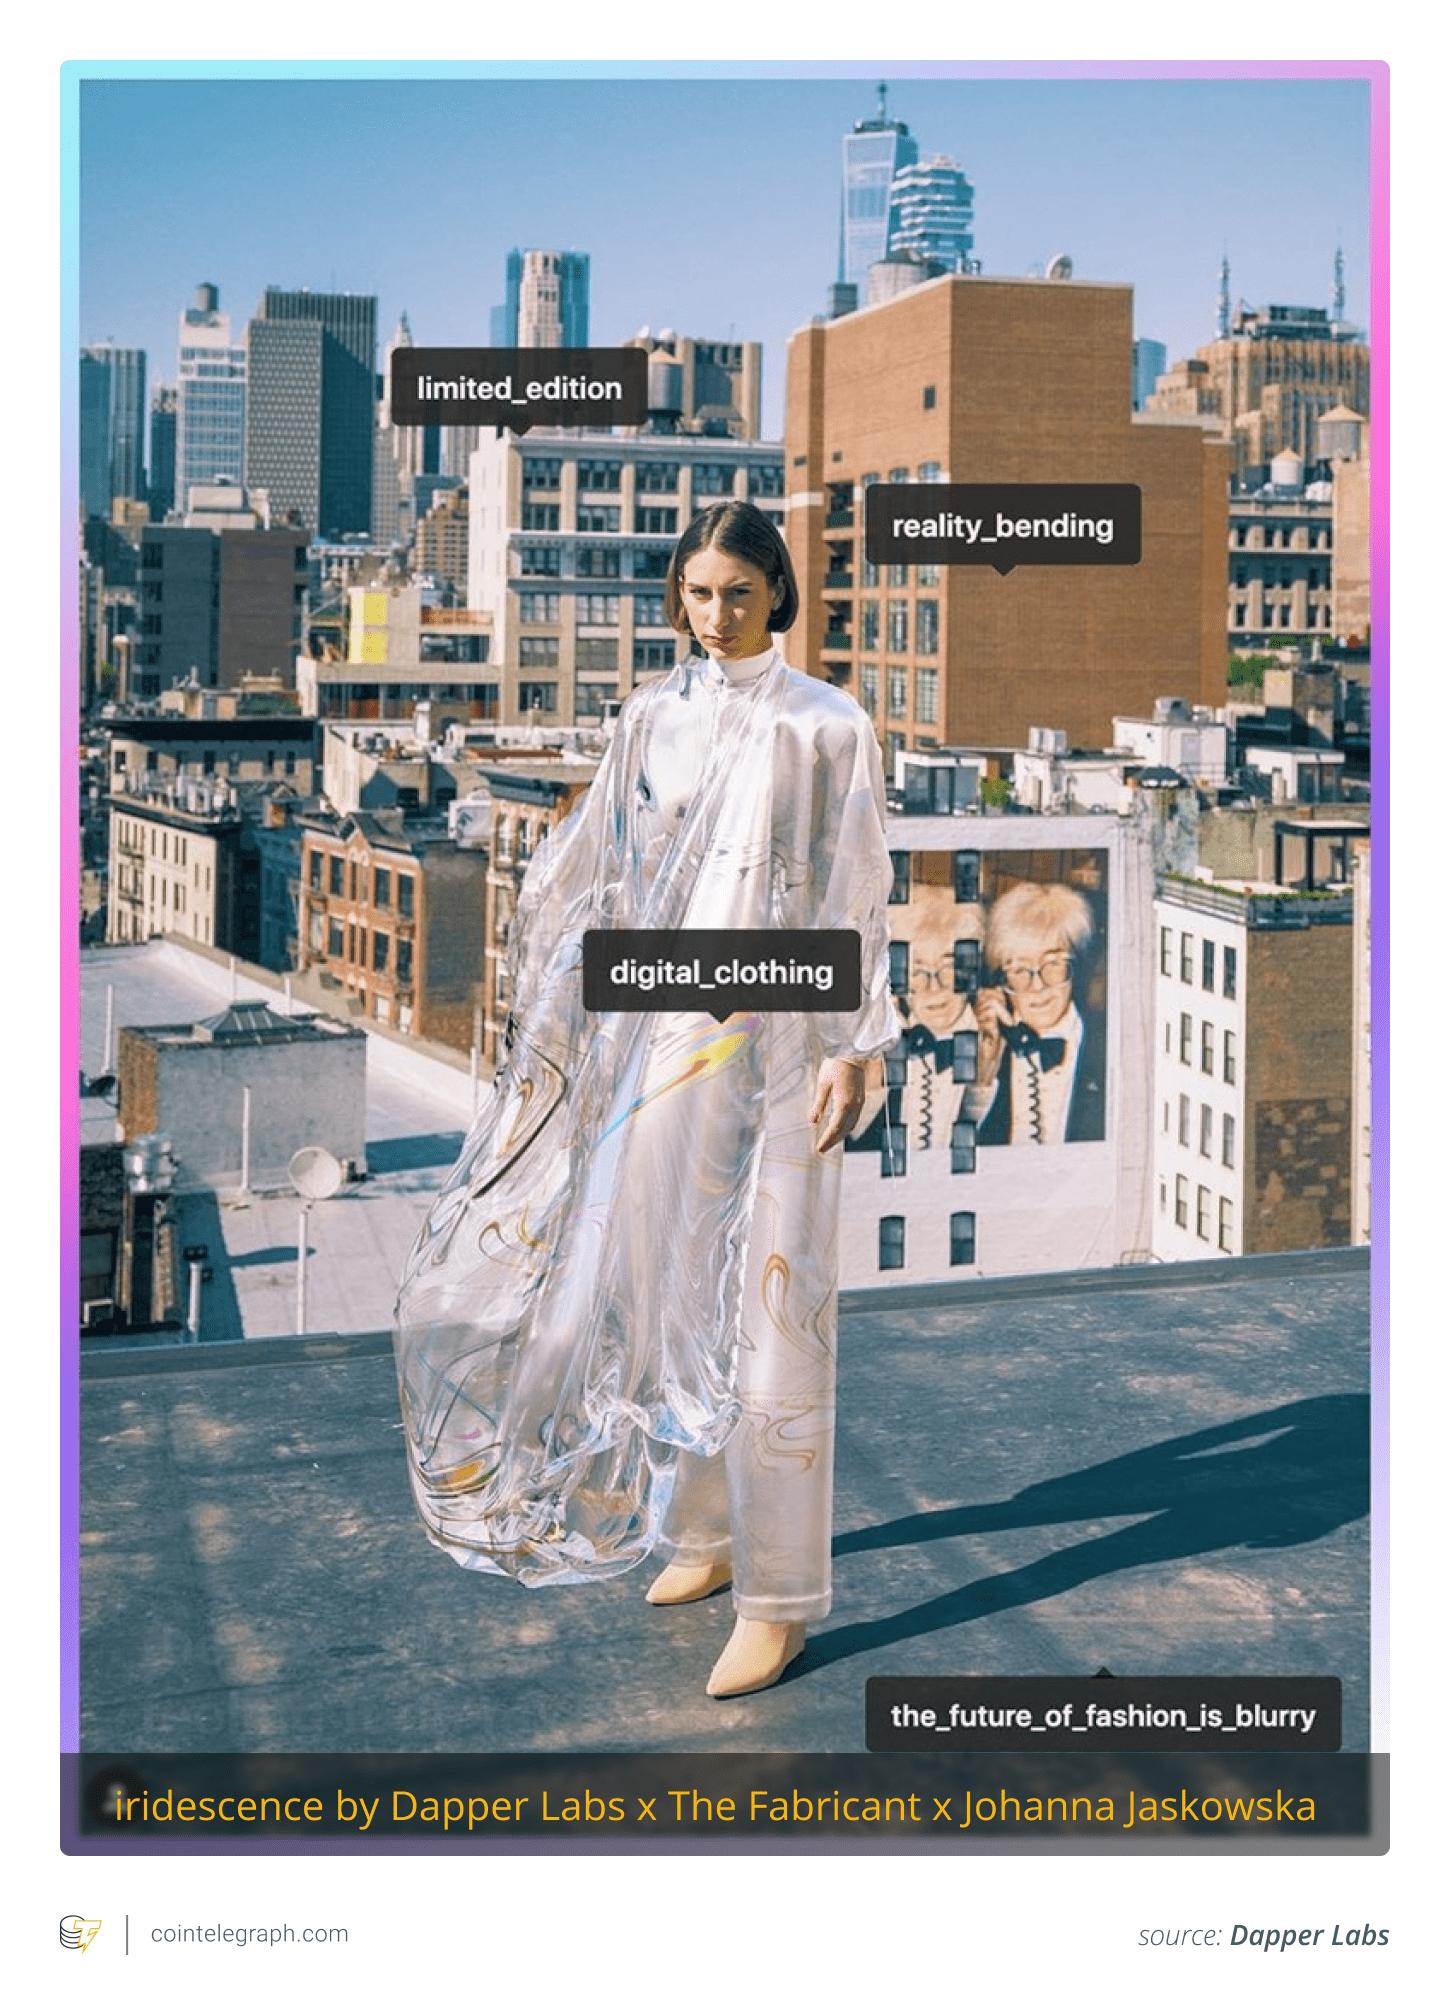 Digitalization at the Paris Fashion Week